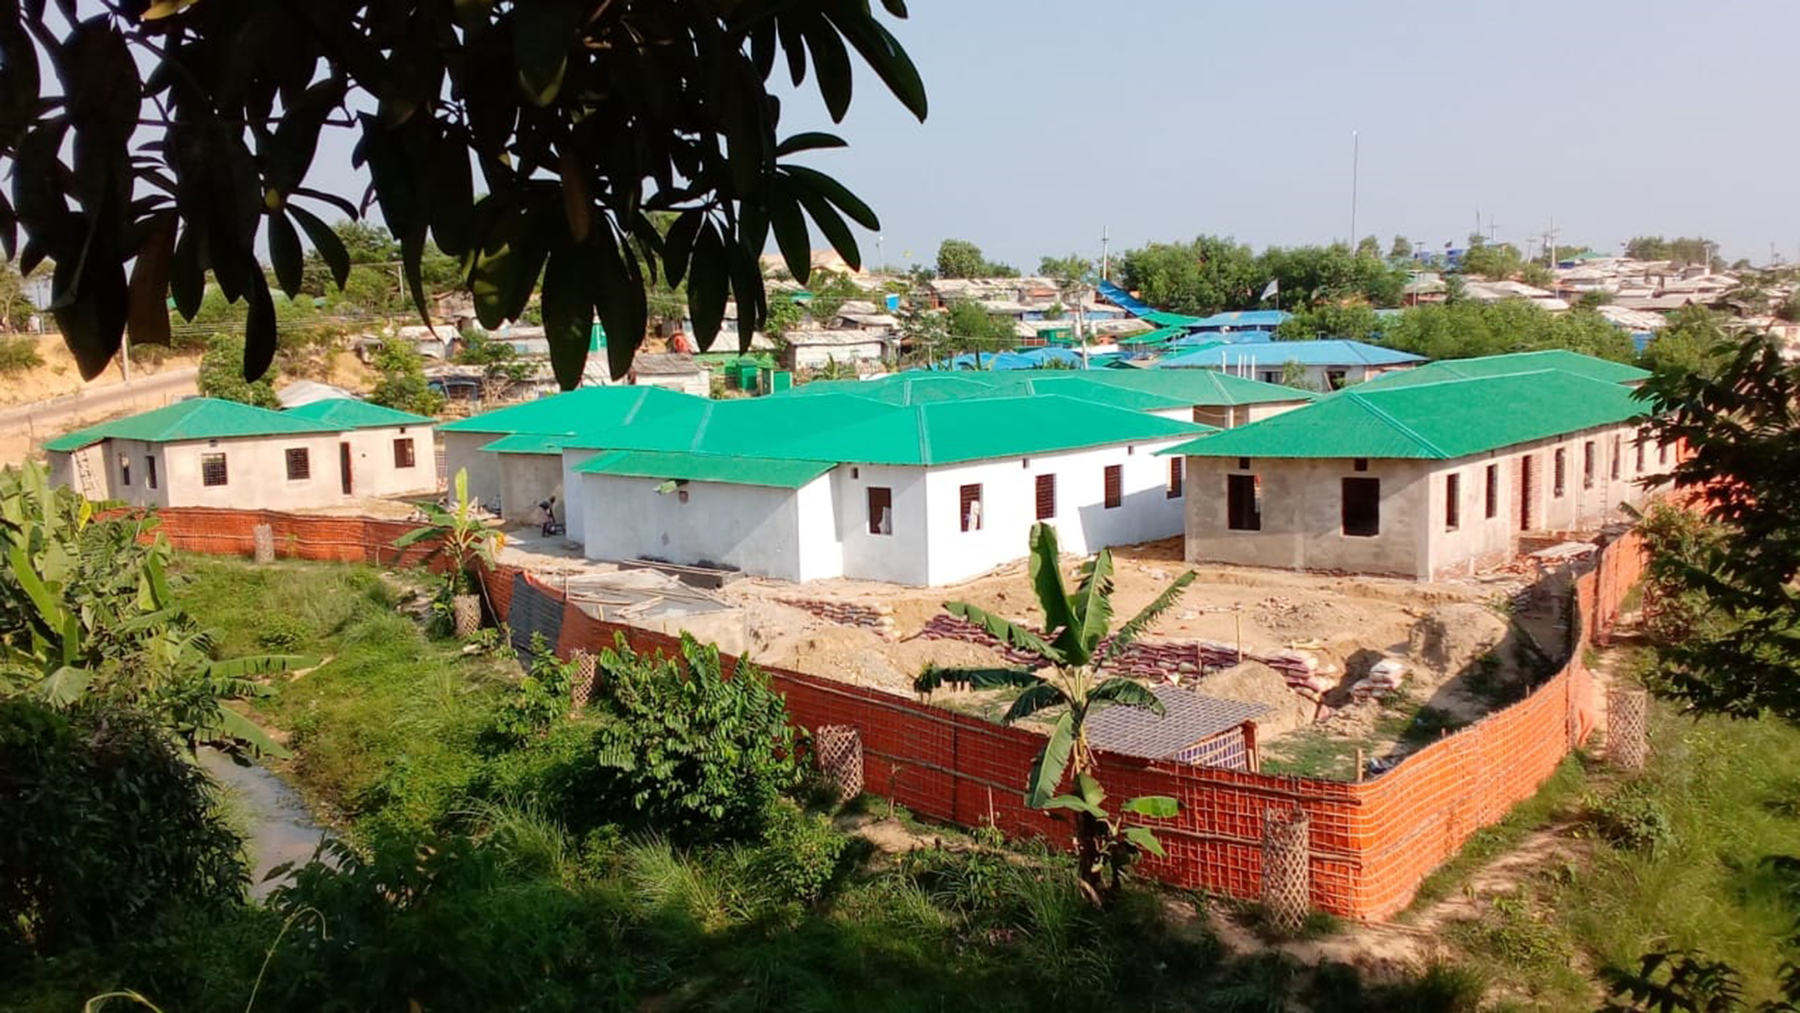 The field hospital's new Covid-19 isolation unit, under construction. (Photo courtesy of Dr. Iftikher Mahmood)